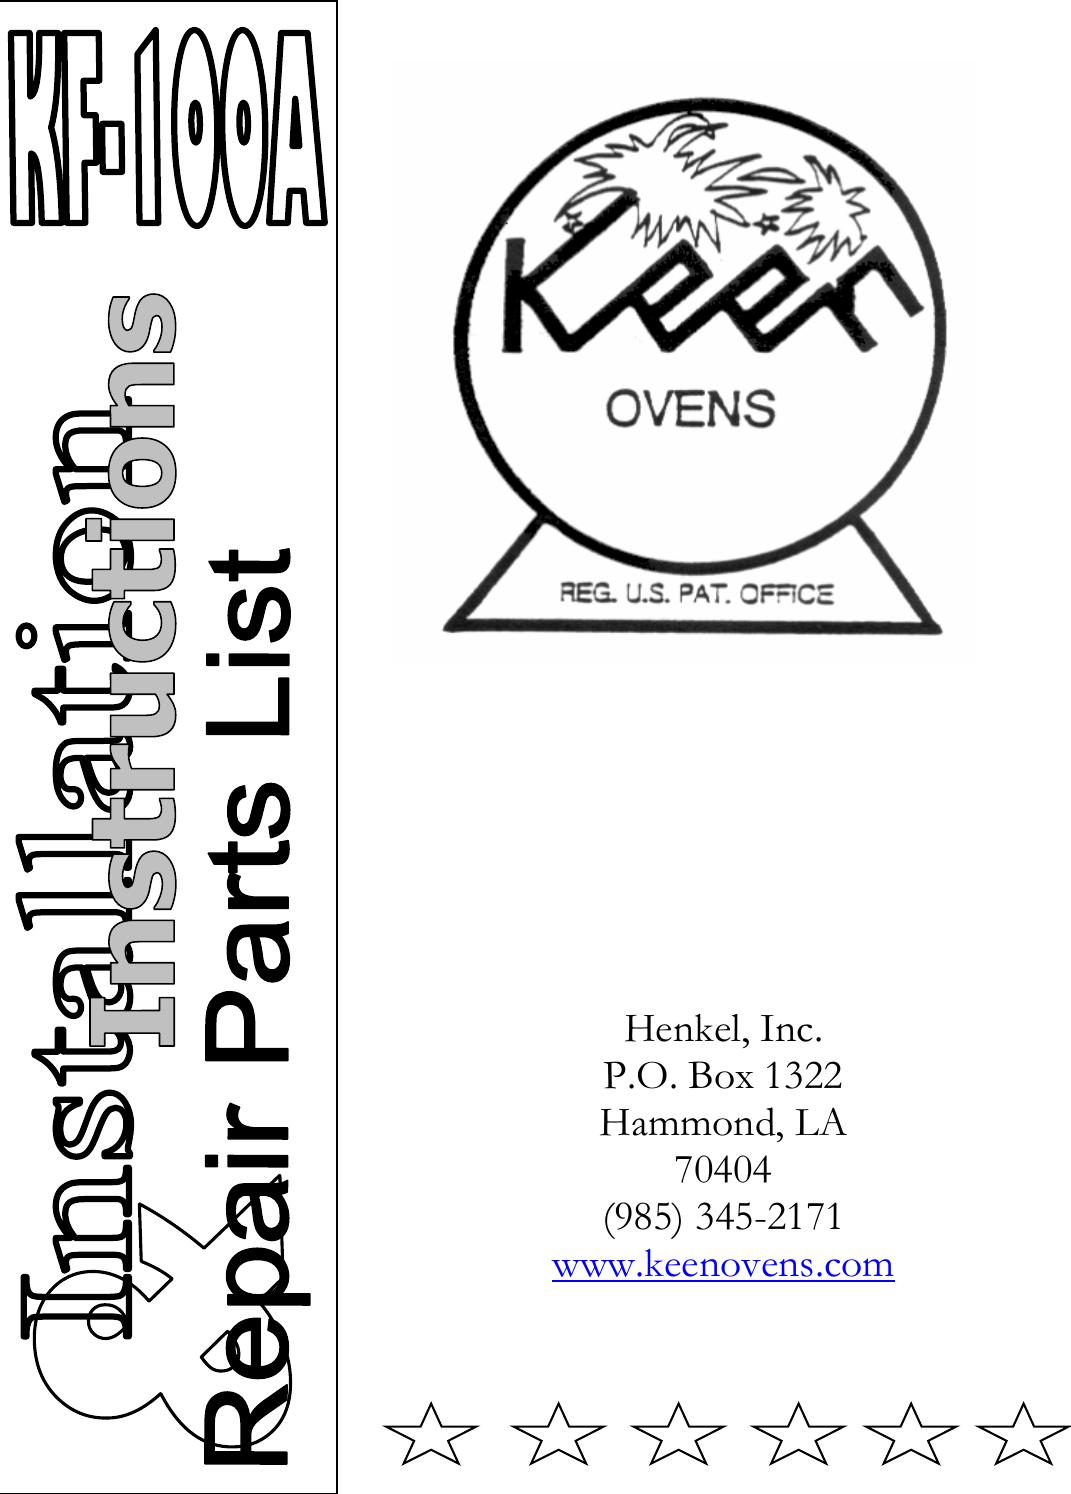 Henkel Keen Kf 100A Users Manual K 15